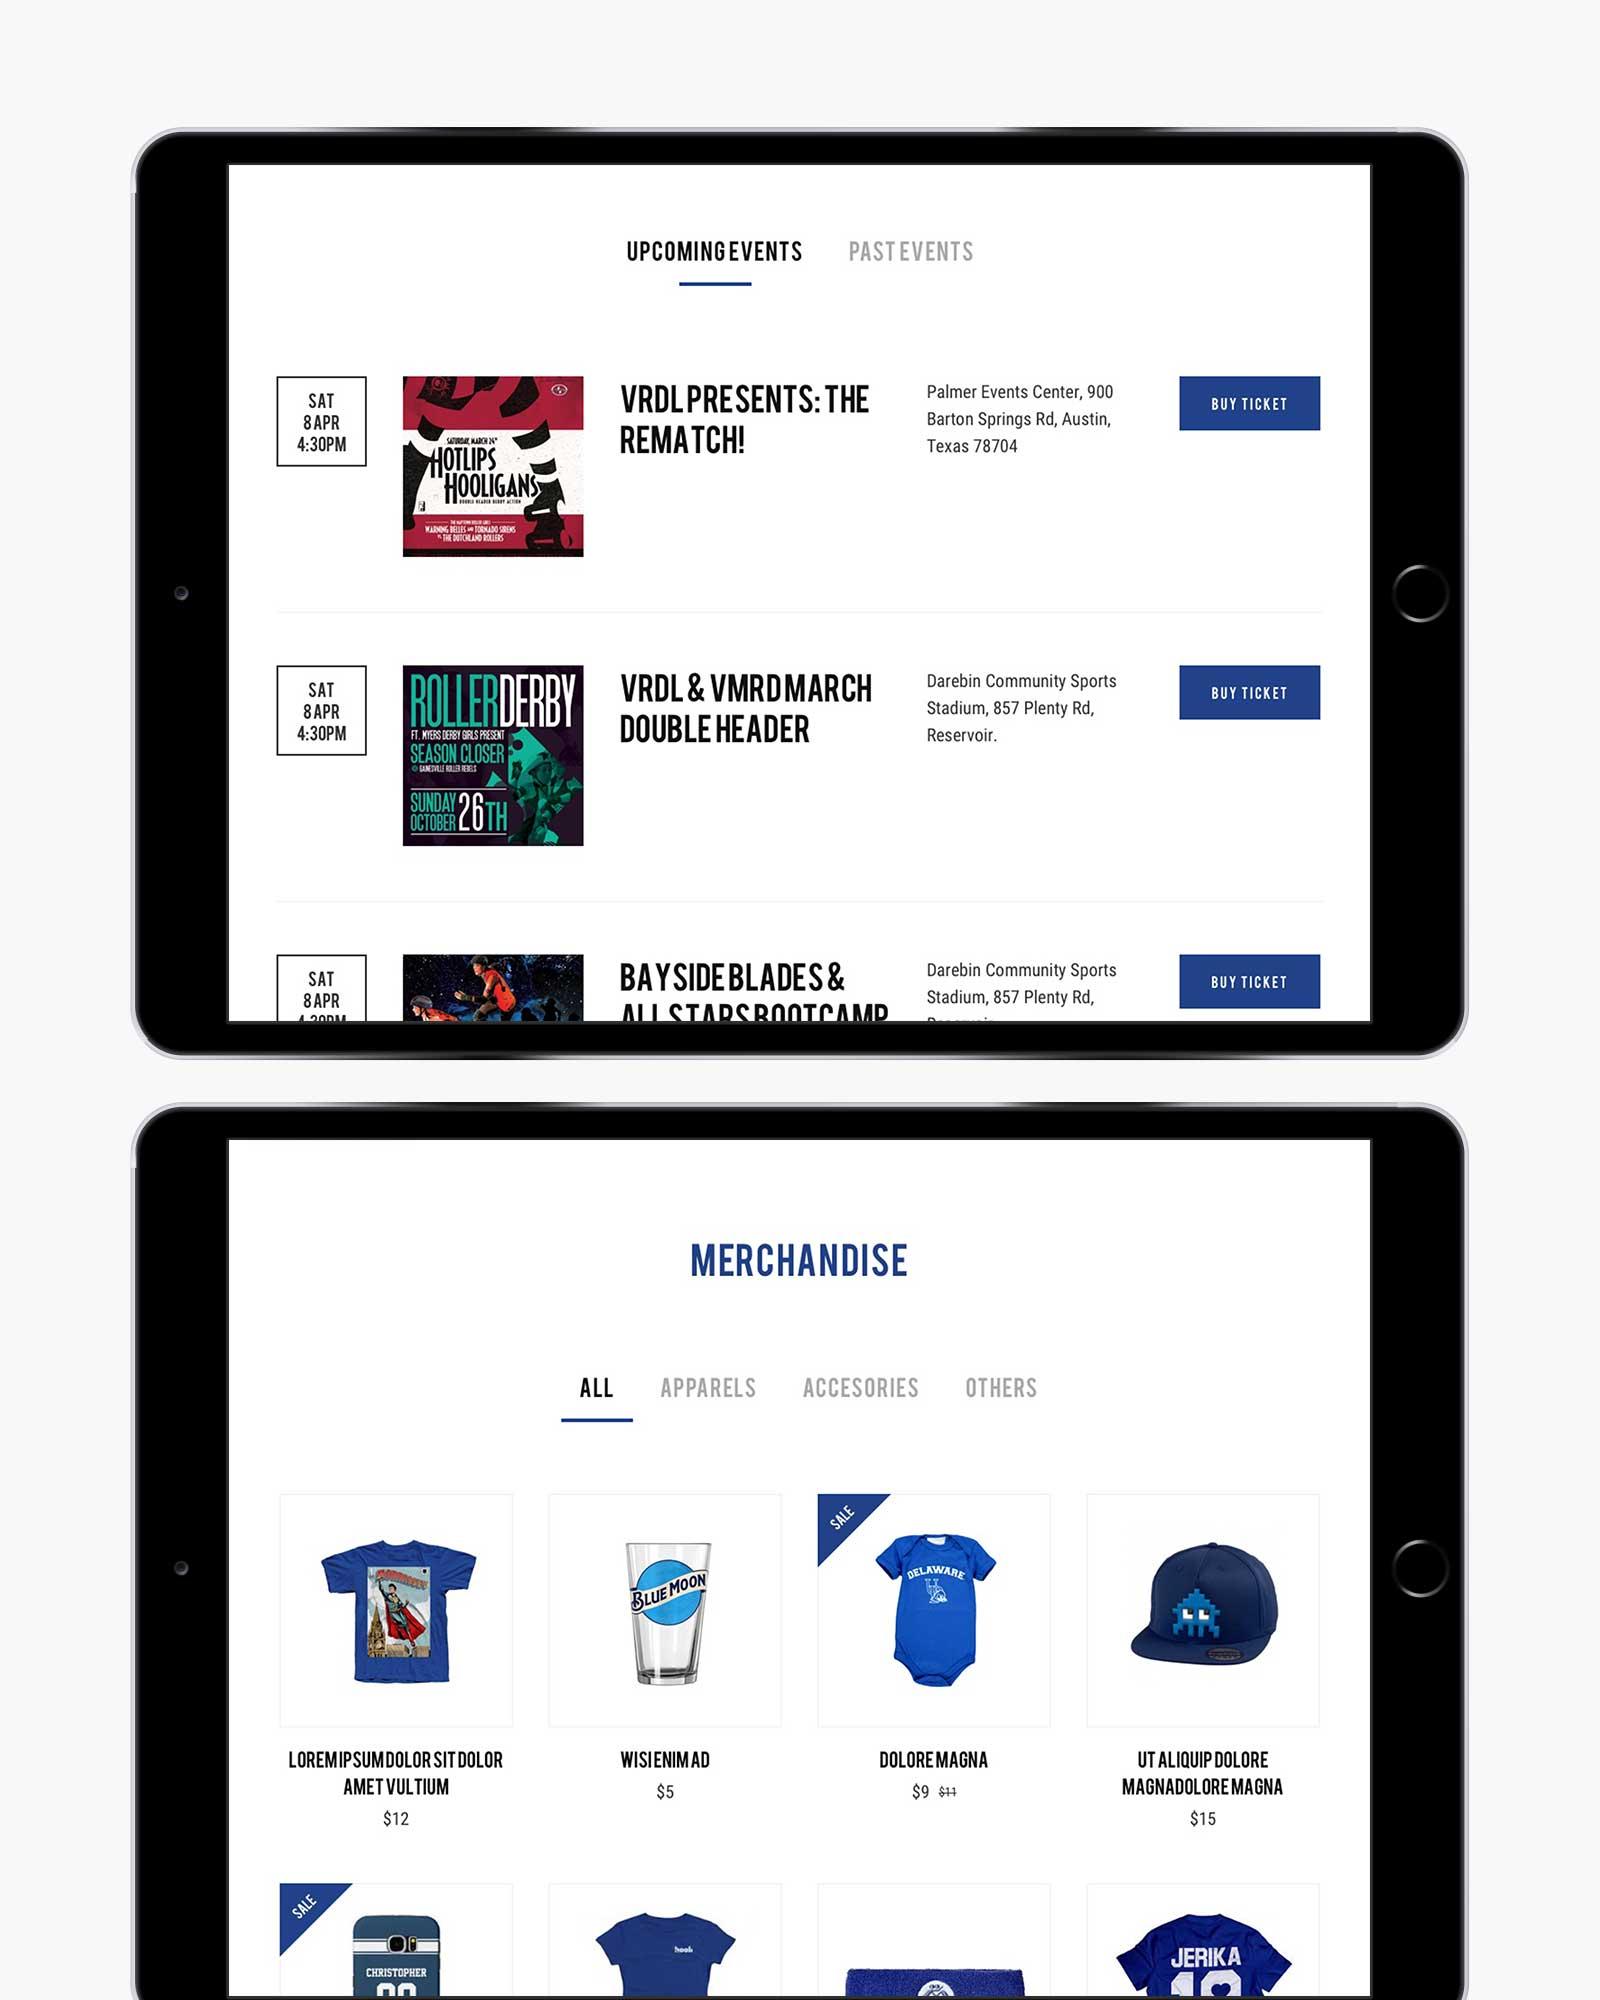 Victorian Roller Derby League responsive website design for shop menu on iPad in landscape view